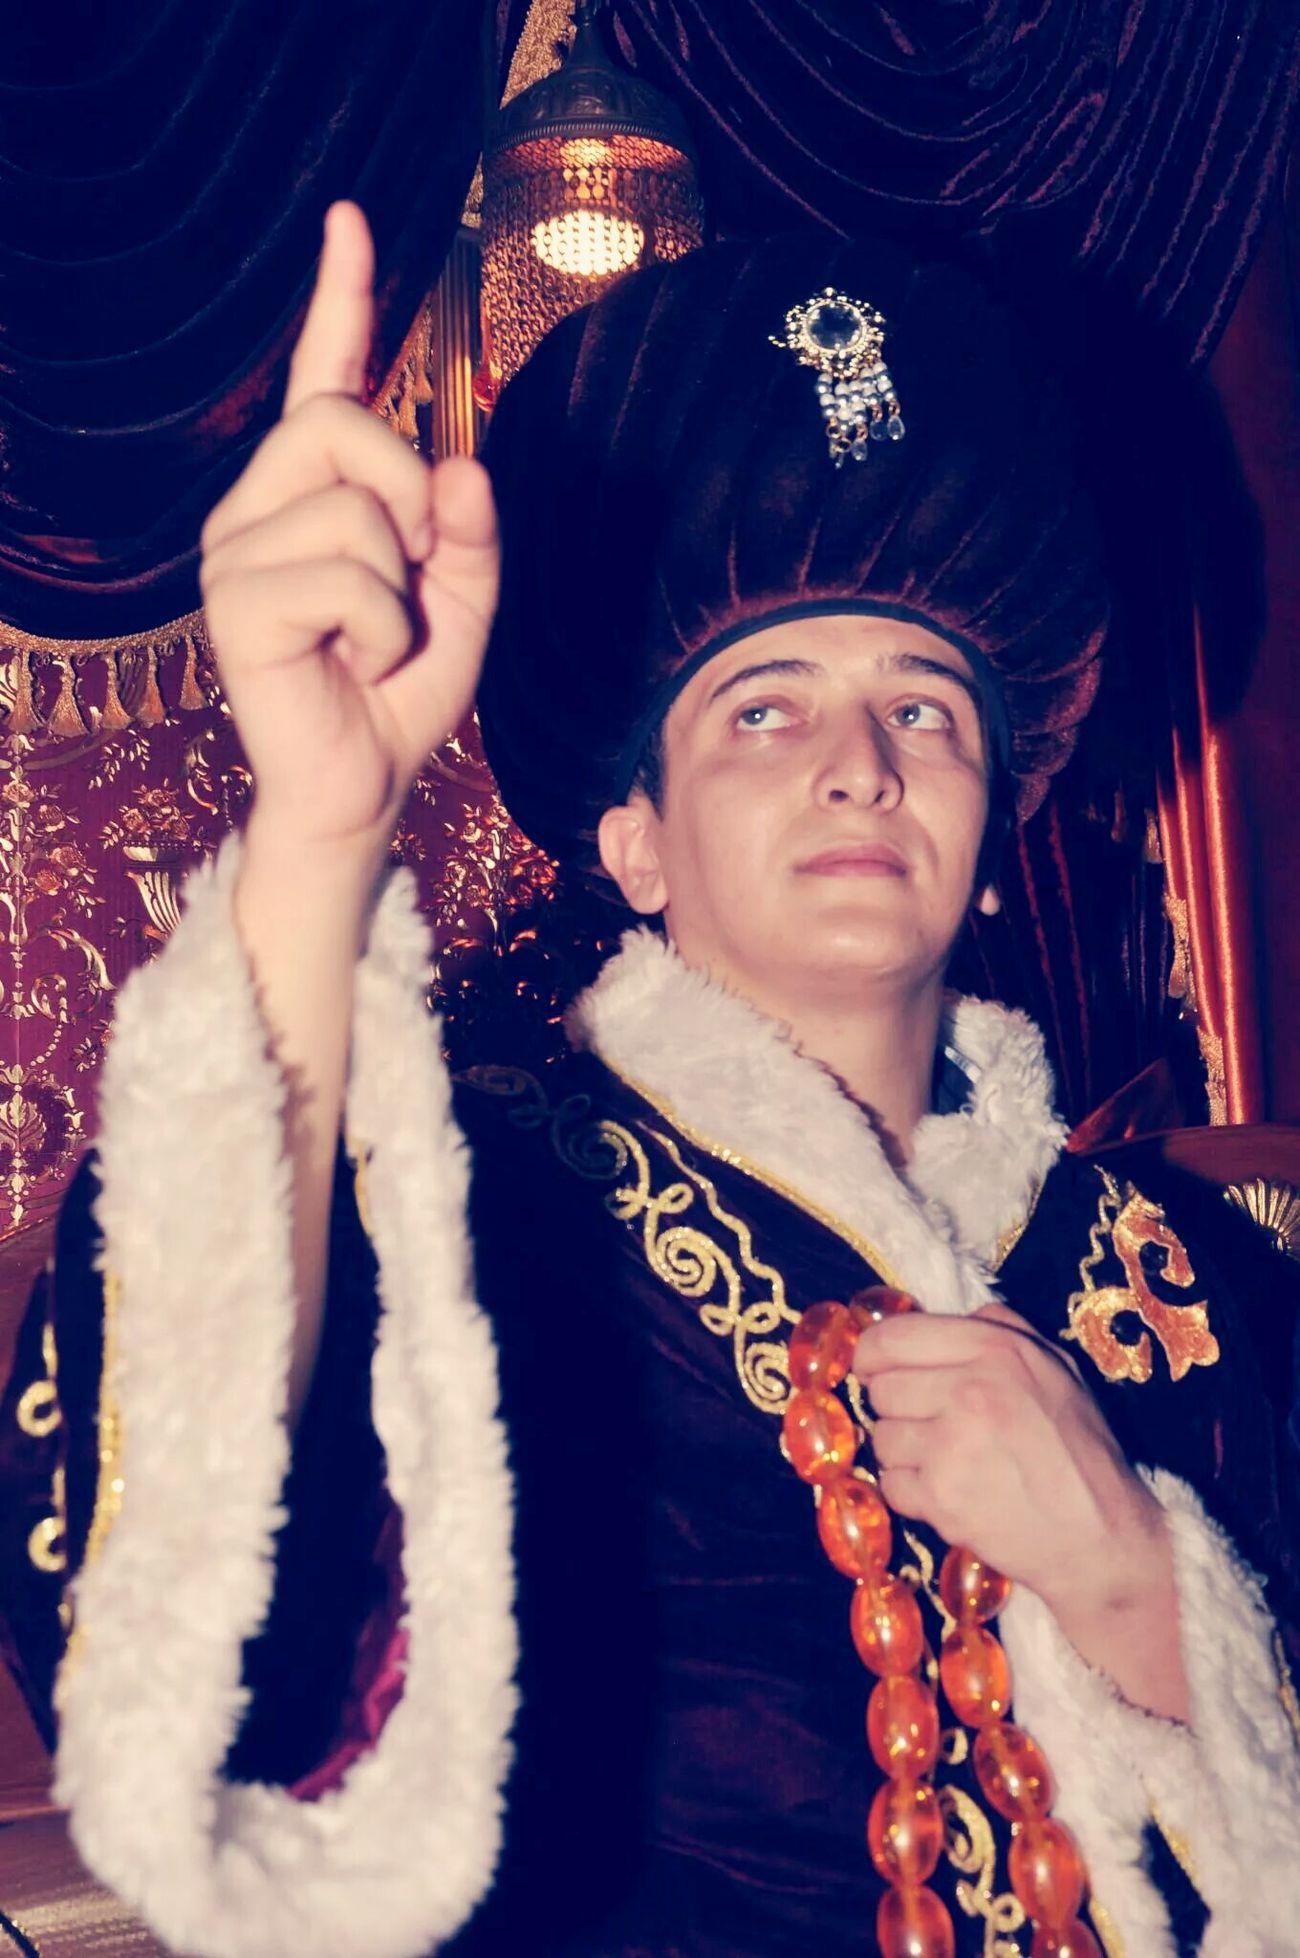 Osmanlı Osmanlıdevleti Ottomans Ottoman Empire Padisah Hi! Goodnight Iyigeceler Iyiaksamlar Relaxing